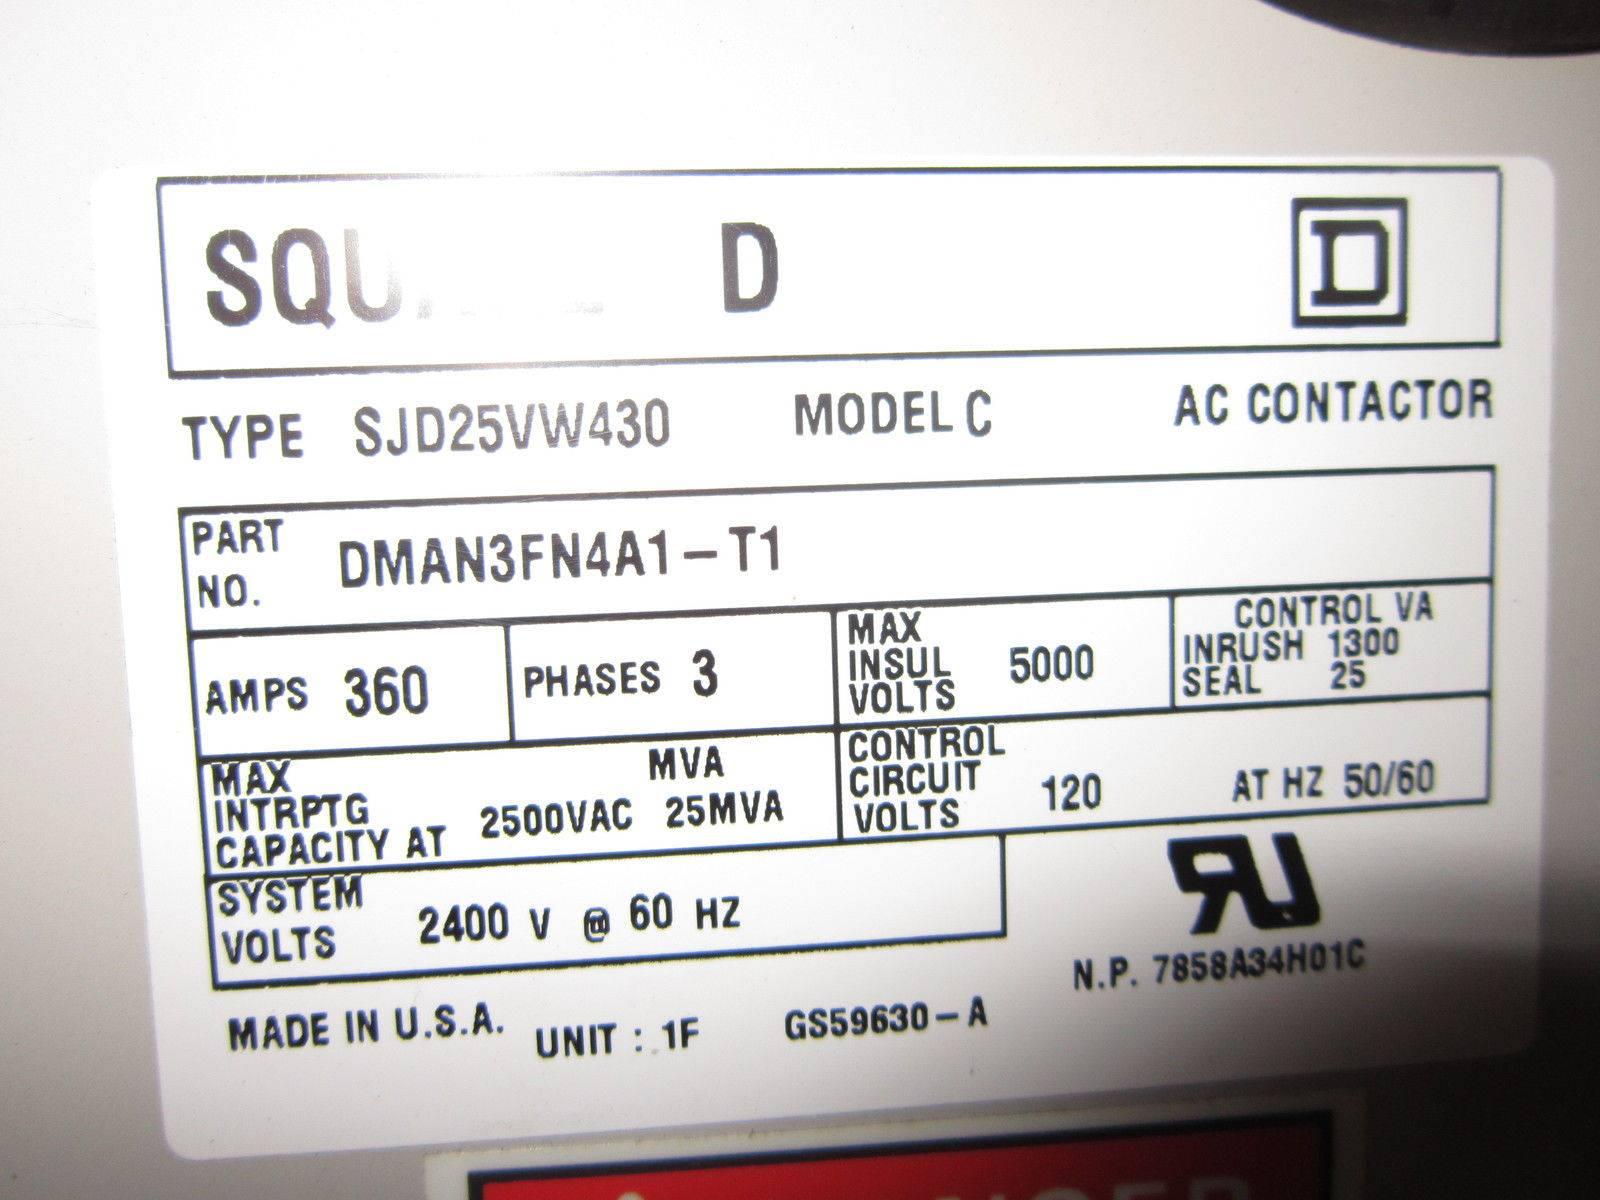 squarediso flexmod_54169_squaredsquaredsqd_mode__10 new square d isoflex model 4 medium voltage controller 5kv 600 hp  at gsmportal.co